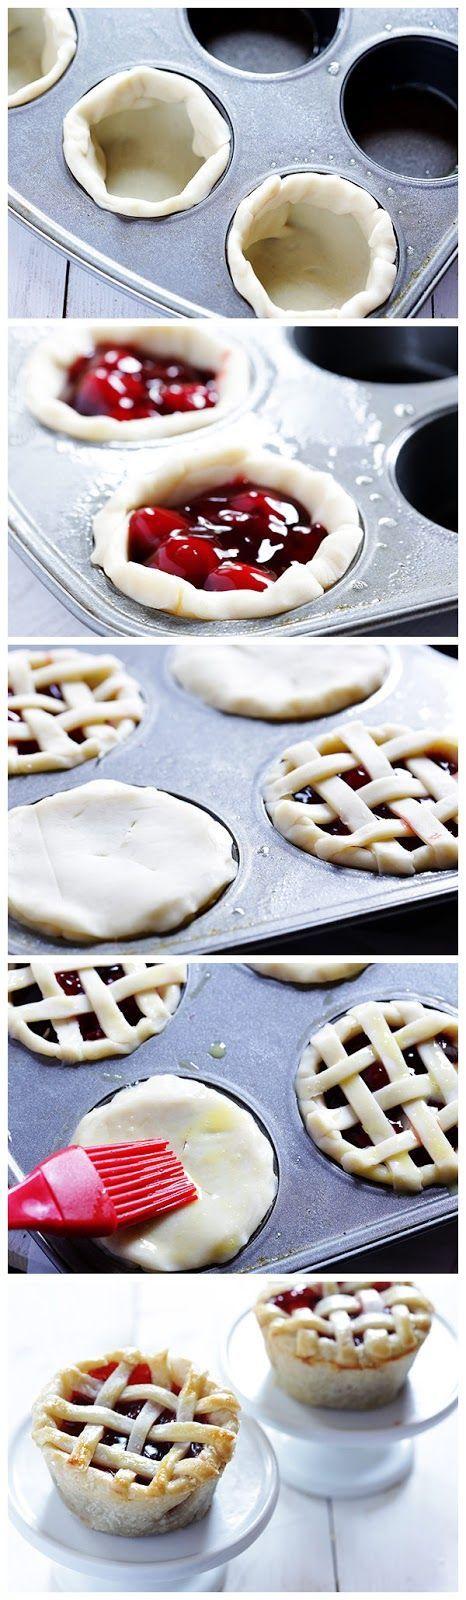 .  #dessert #easy #recipe #sweet #recipes